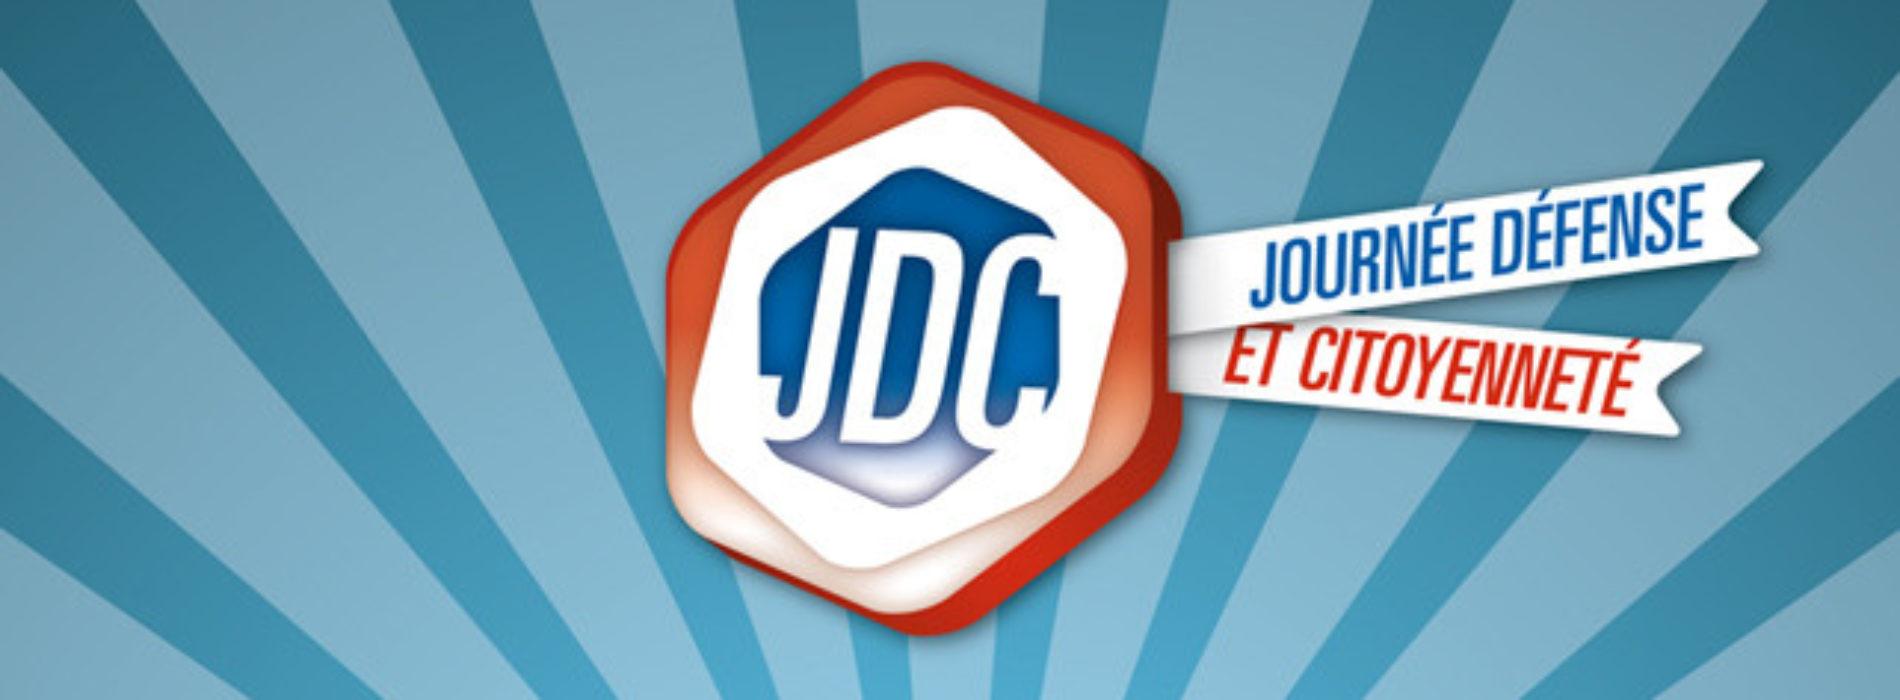 JOURNEES DEFENSES ET CITOYENNETE (JDC) ANNULEES